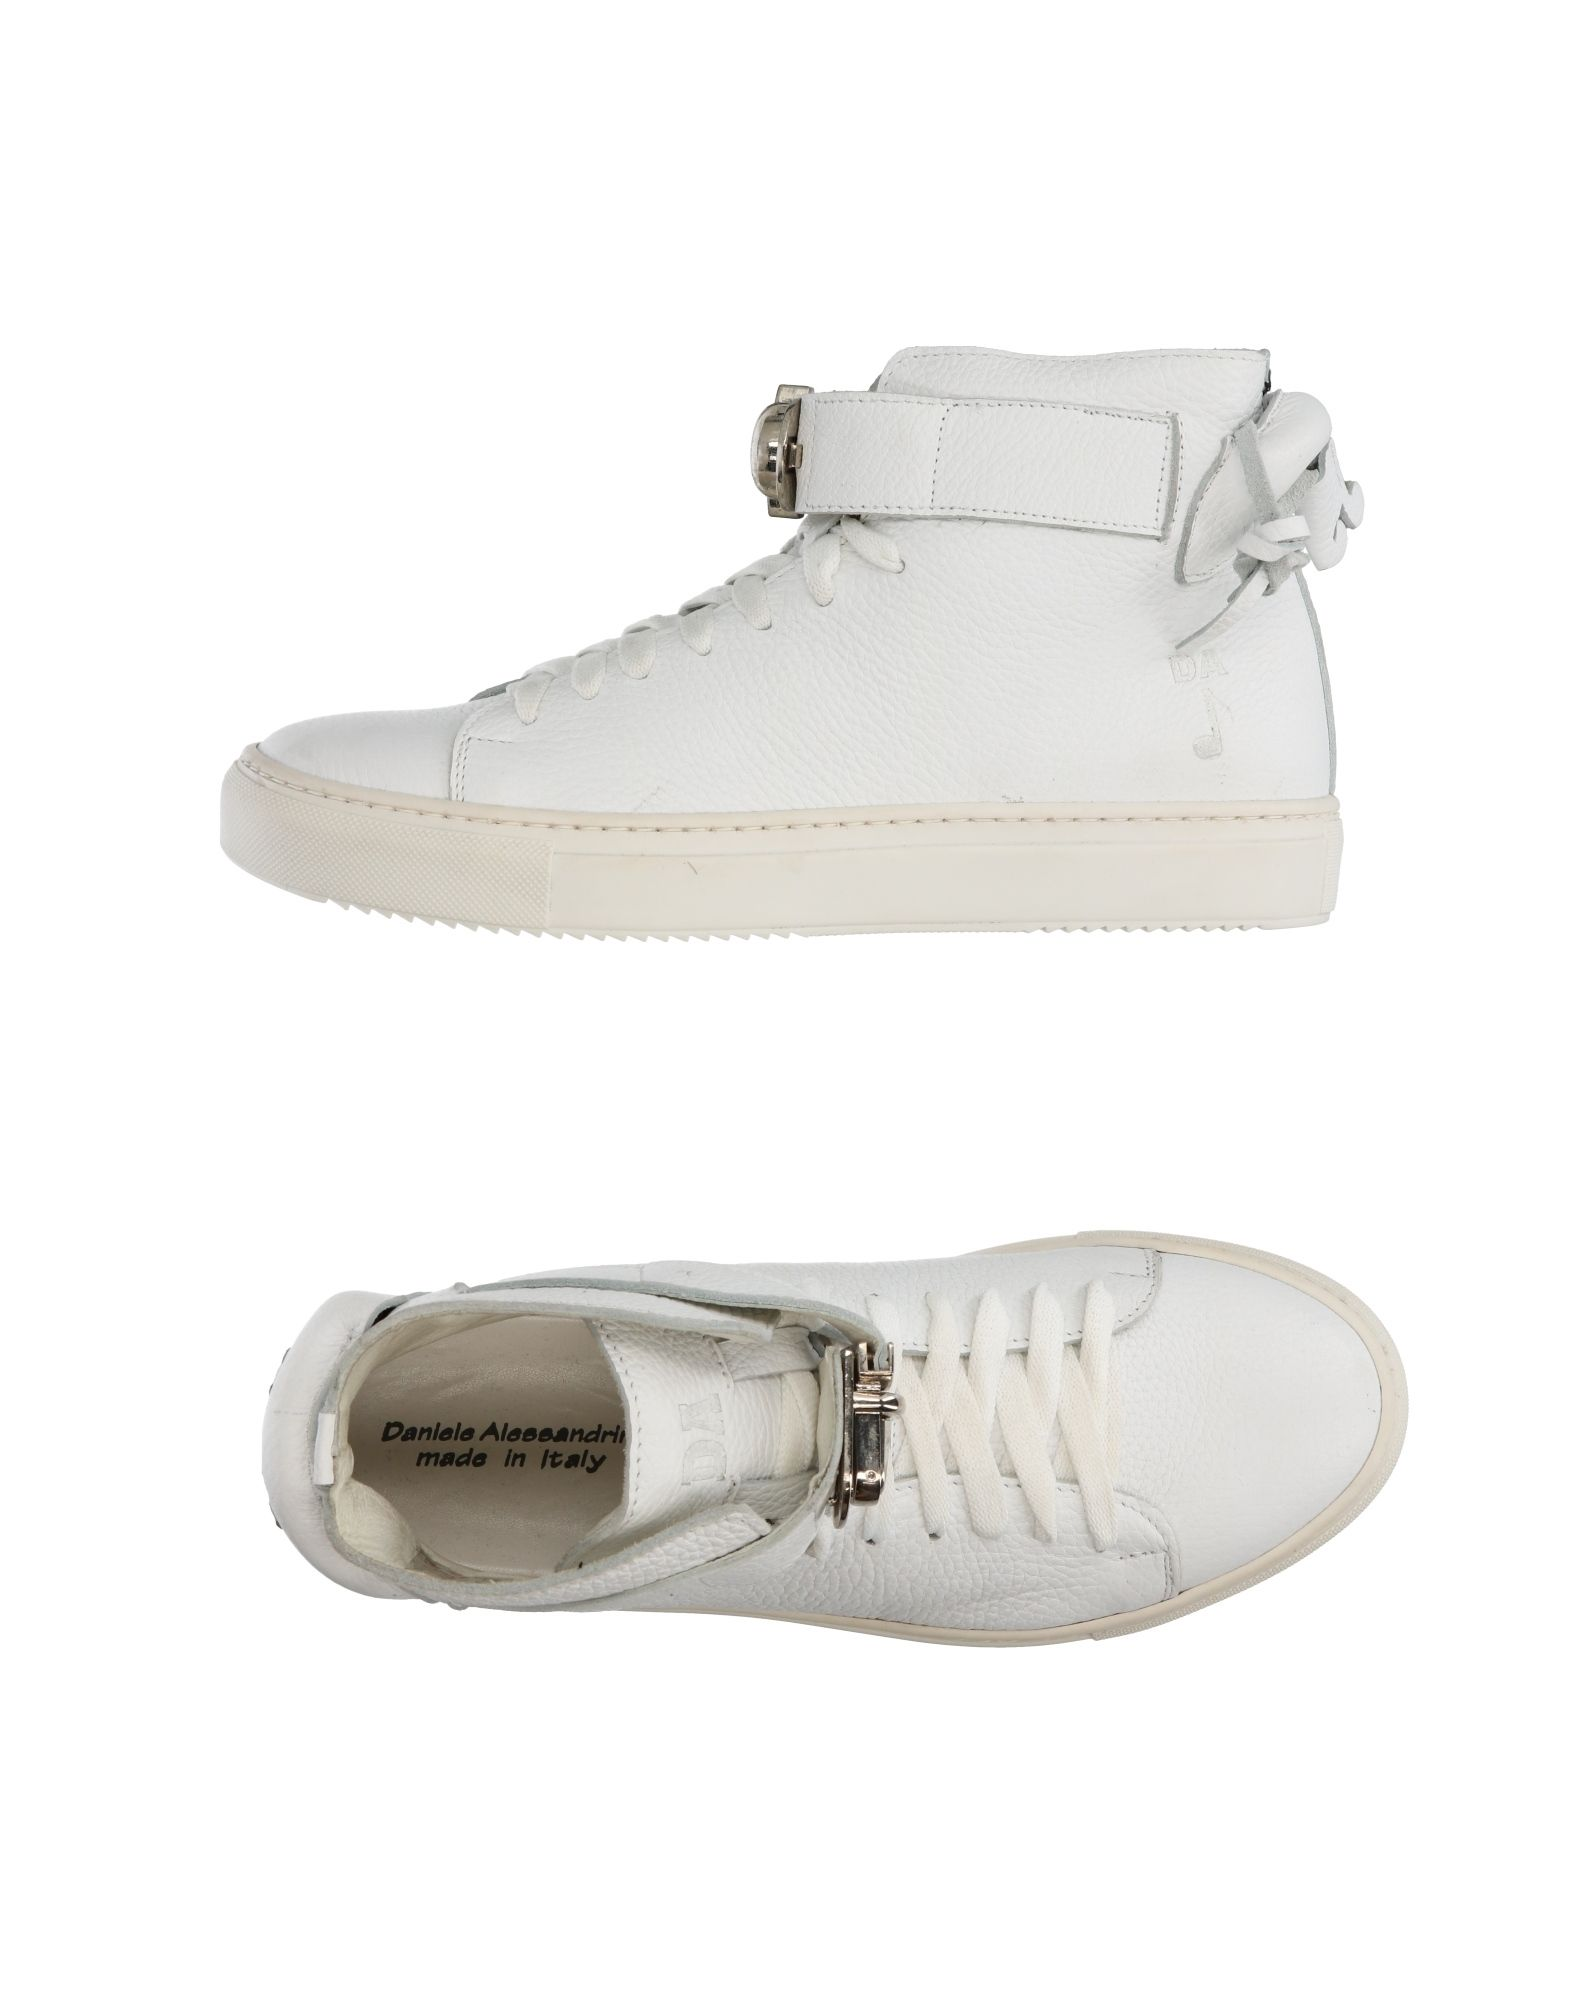 Daniele Alessandrini Sneakers - Men Daniele Alessandrini Alessandrini Alessandrini Sneakers online on  Canada - 11265274IT 860ce8